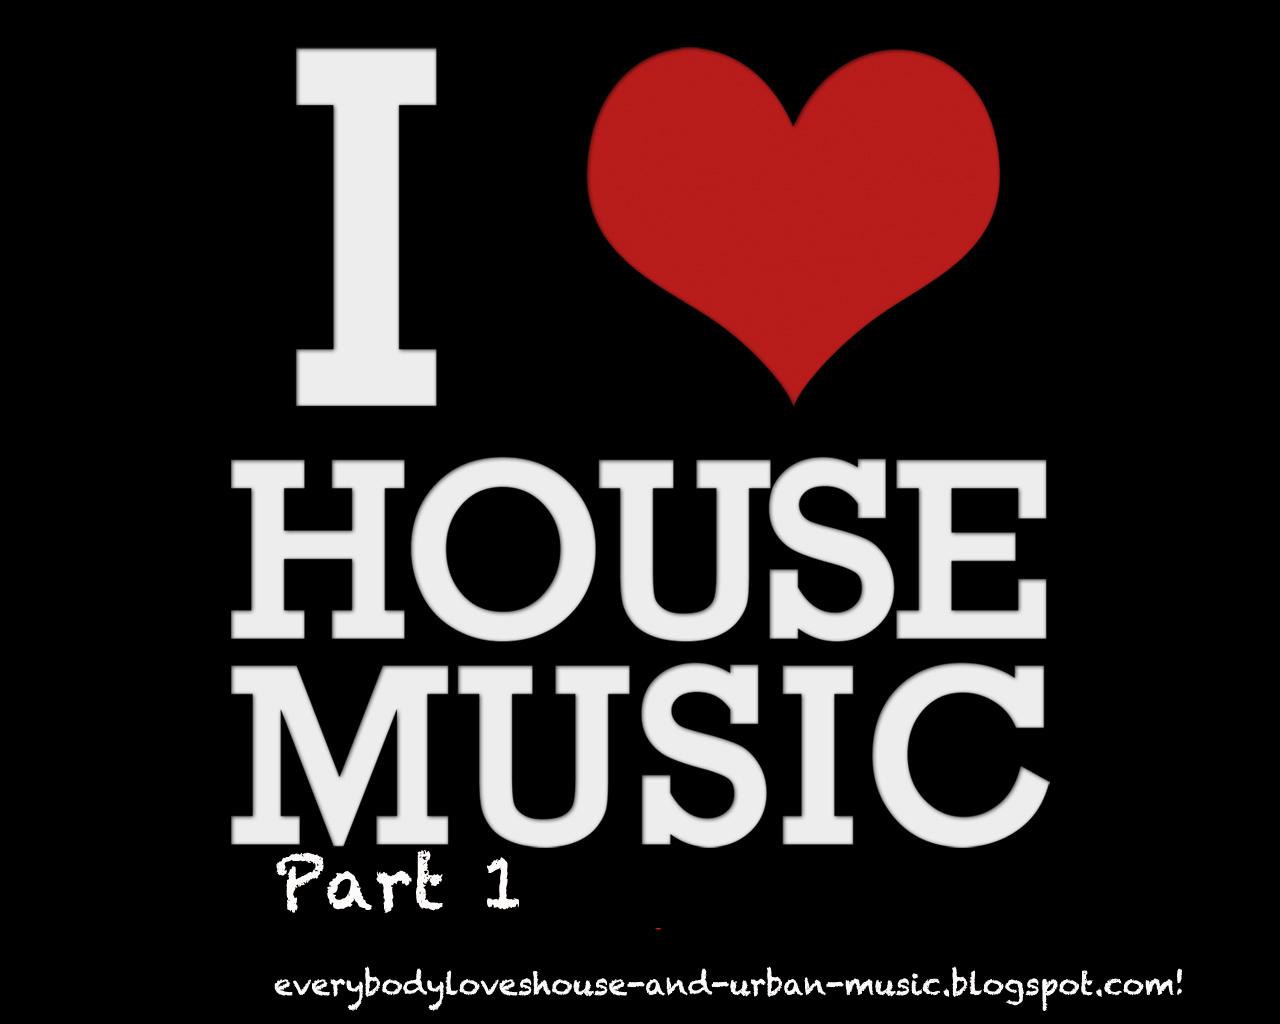 http://1.bp.blogspot.com/-sr6CgOHsgdA/TezpeBPWCsI/AAAAAAAAABo/zLK05v_nhso/s1600/i_love_housemusic.jpg